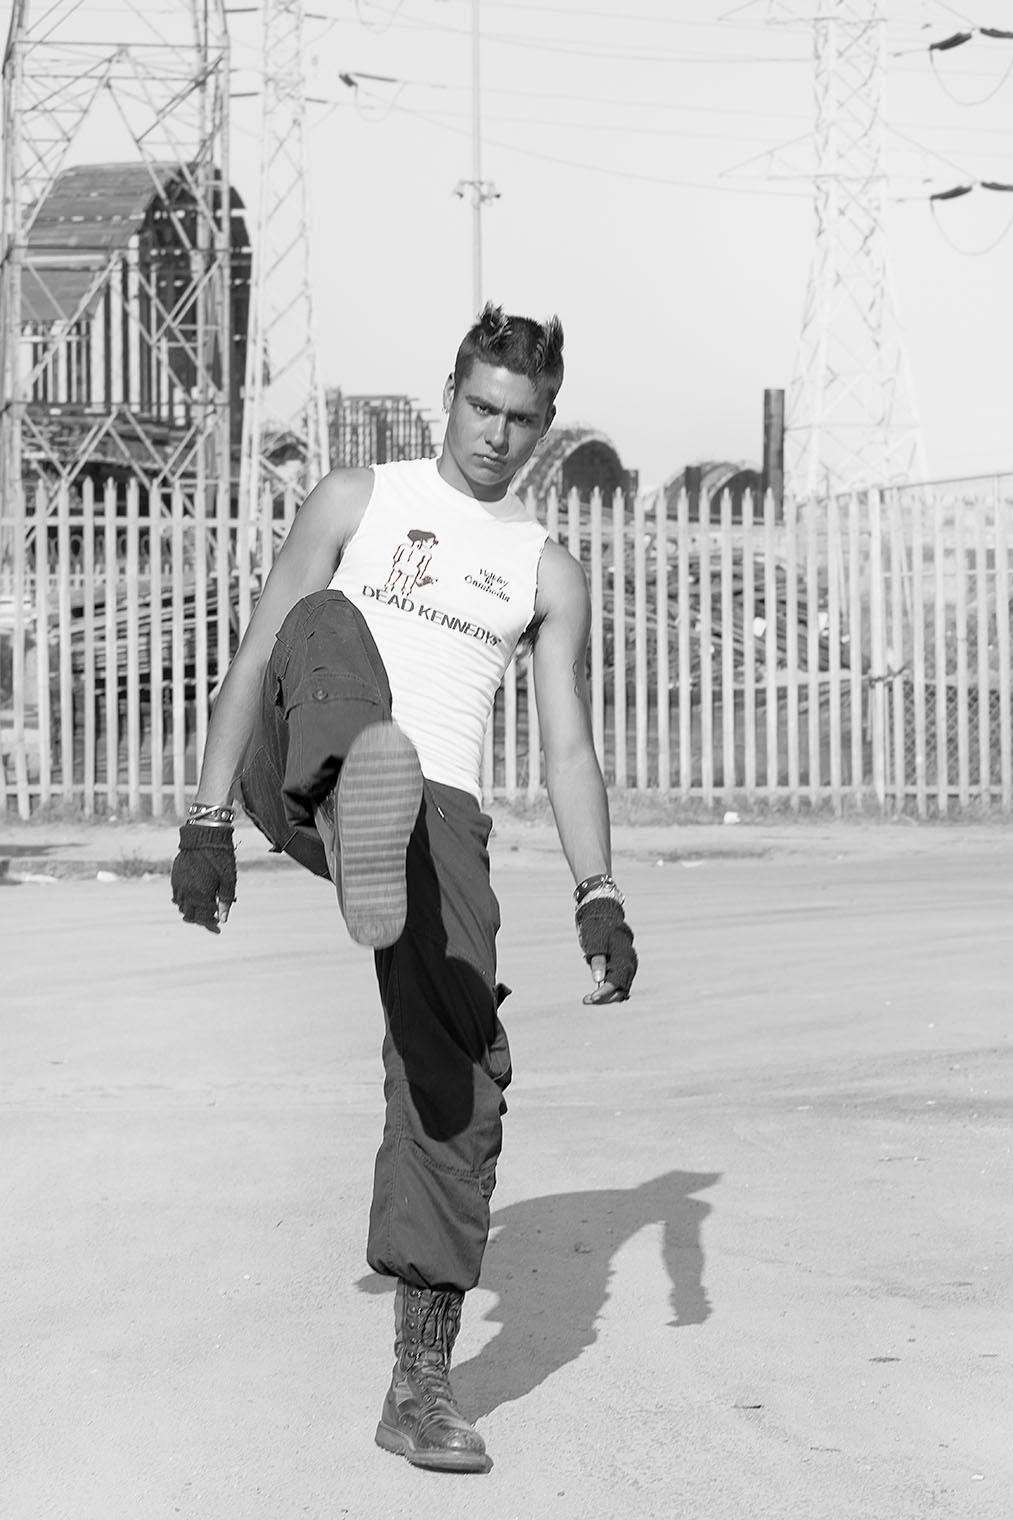 man raising leg to kick at fashion photographer's camera at mensstyle and accessories photo fashion shoot in Los Angeles, California